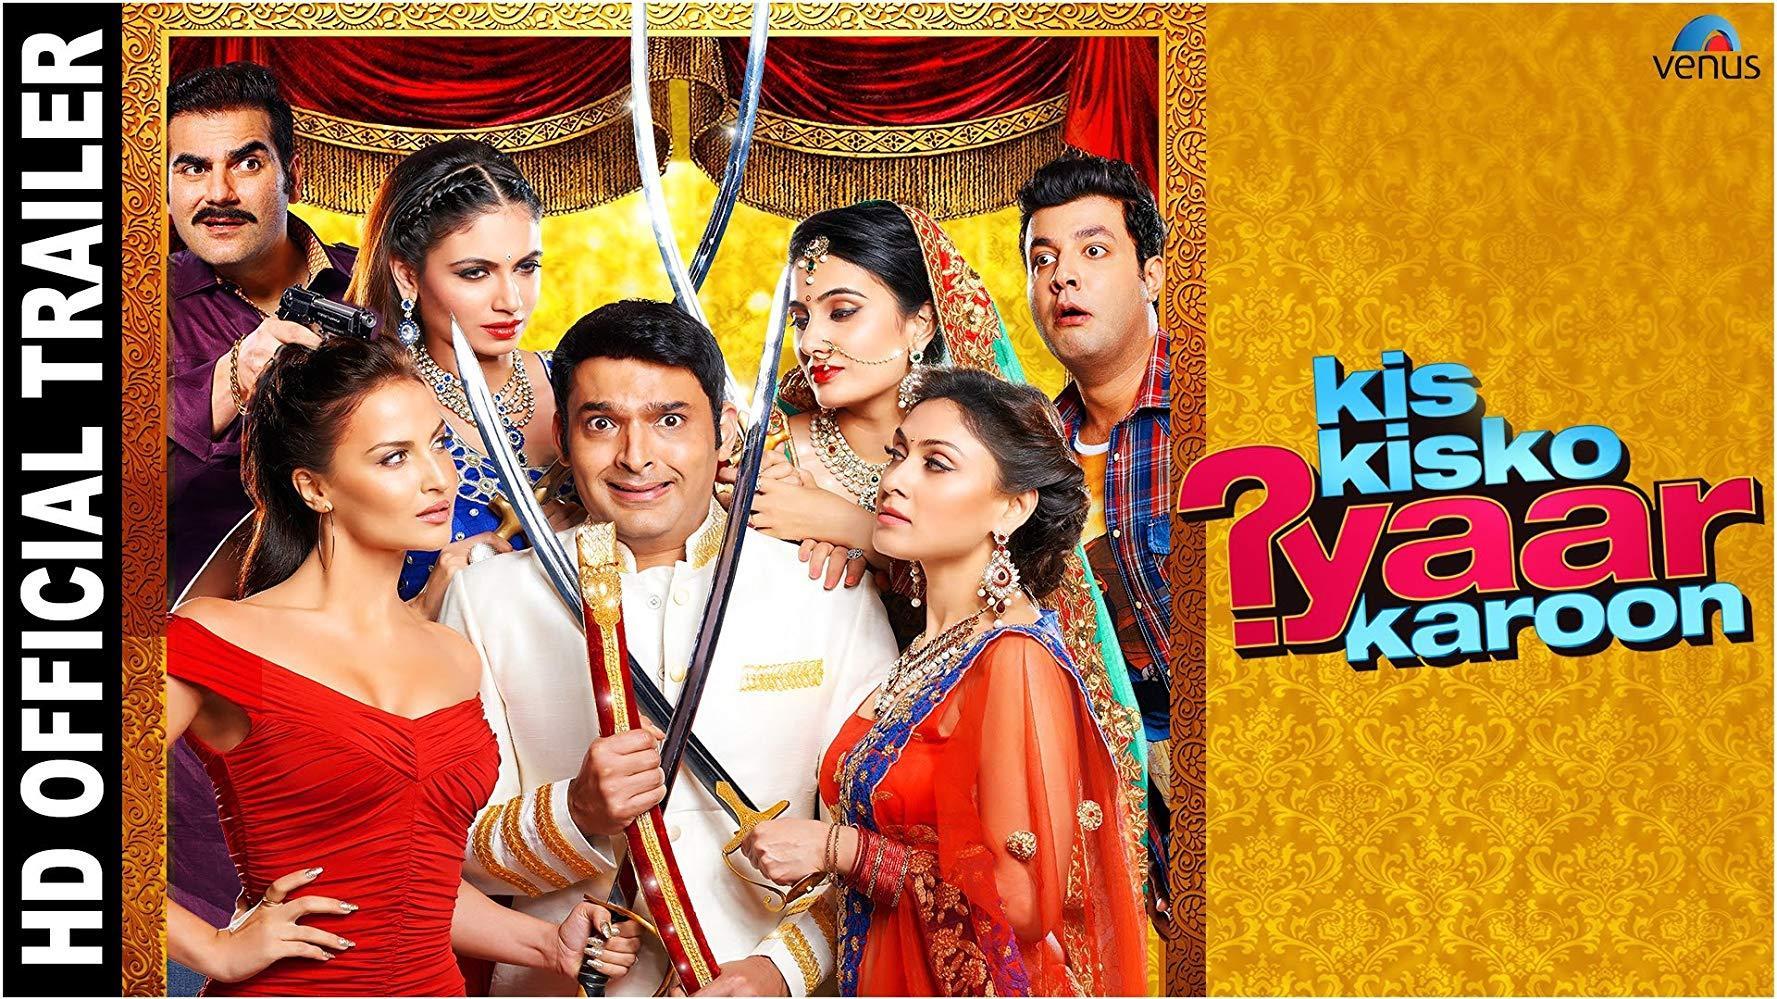 مشاهدة فيلم Kis Kisko Pyaar Karu 2015 HD مترجم كامل اون لاين